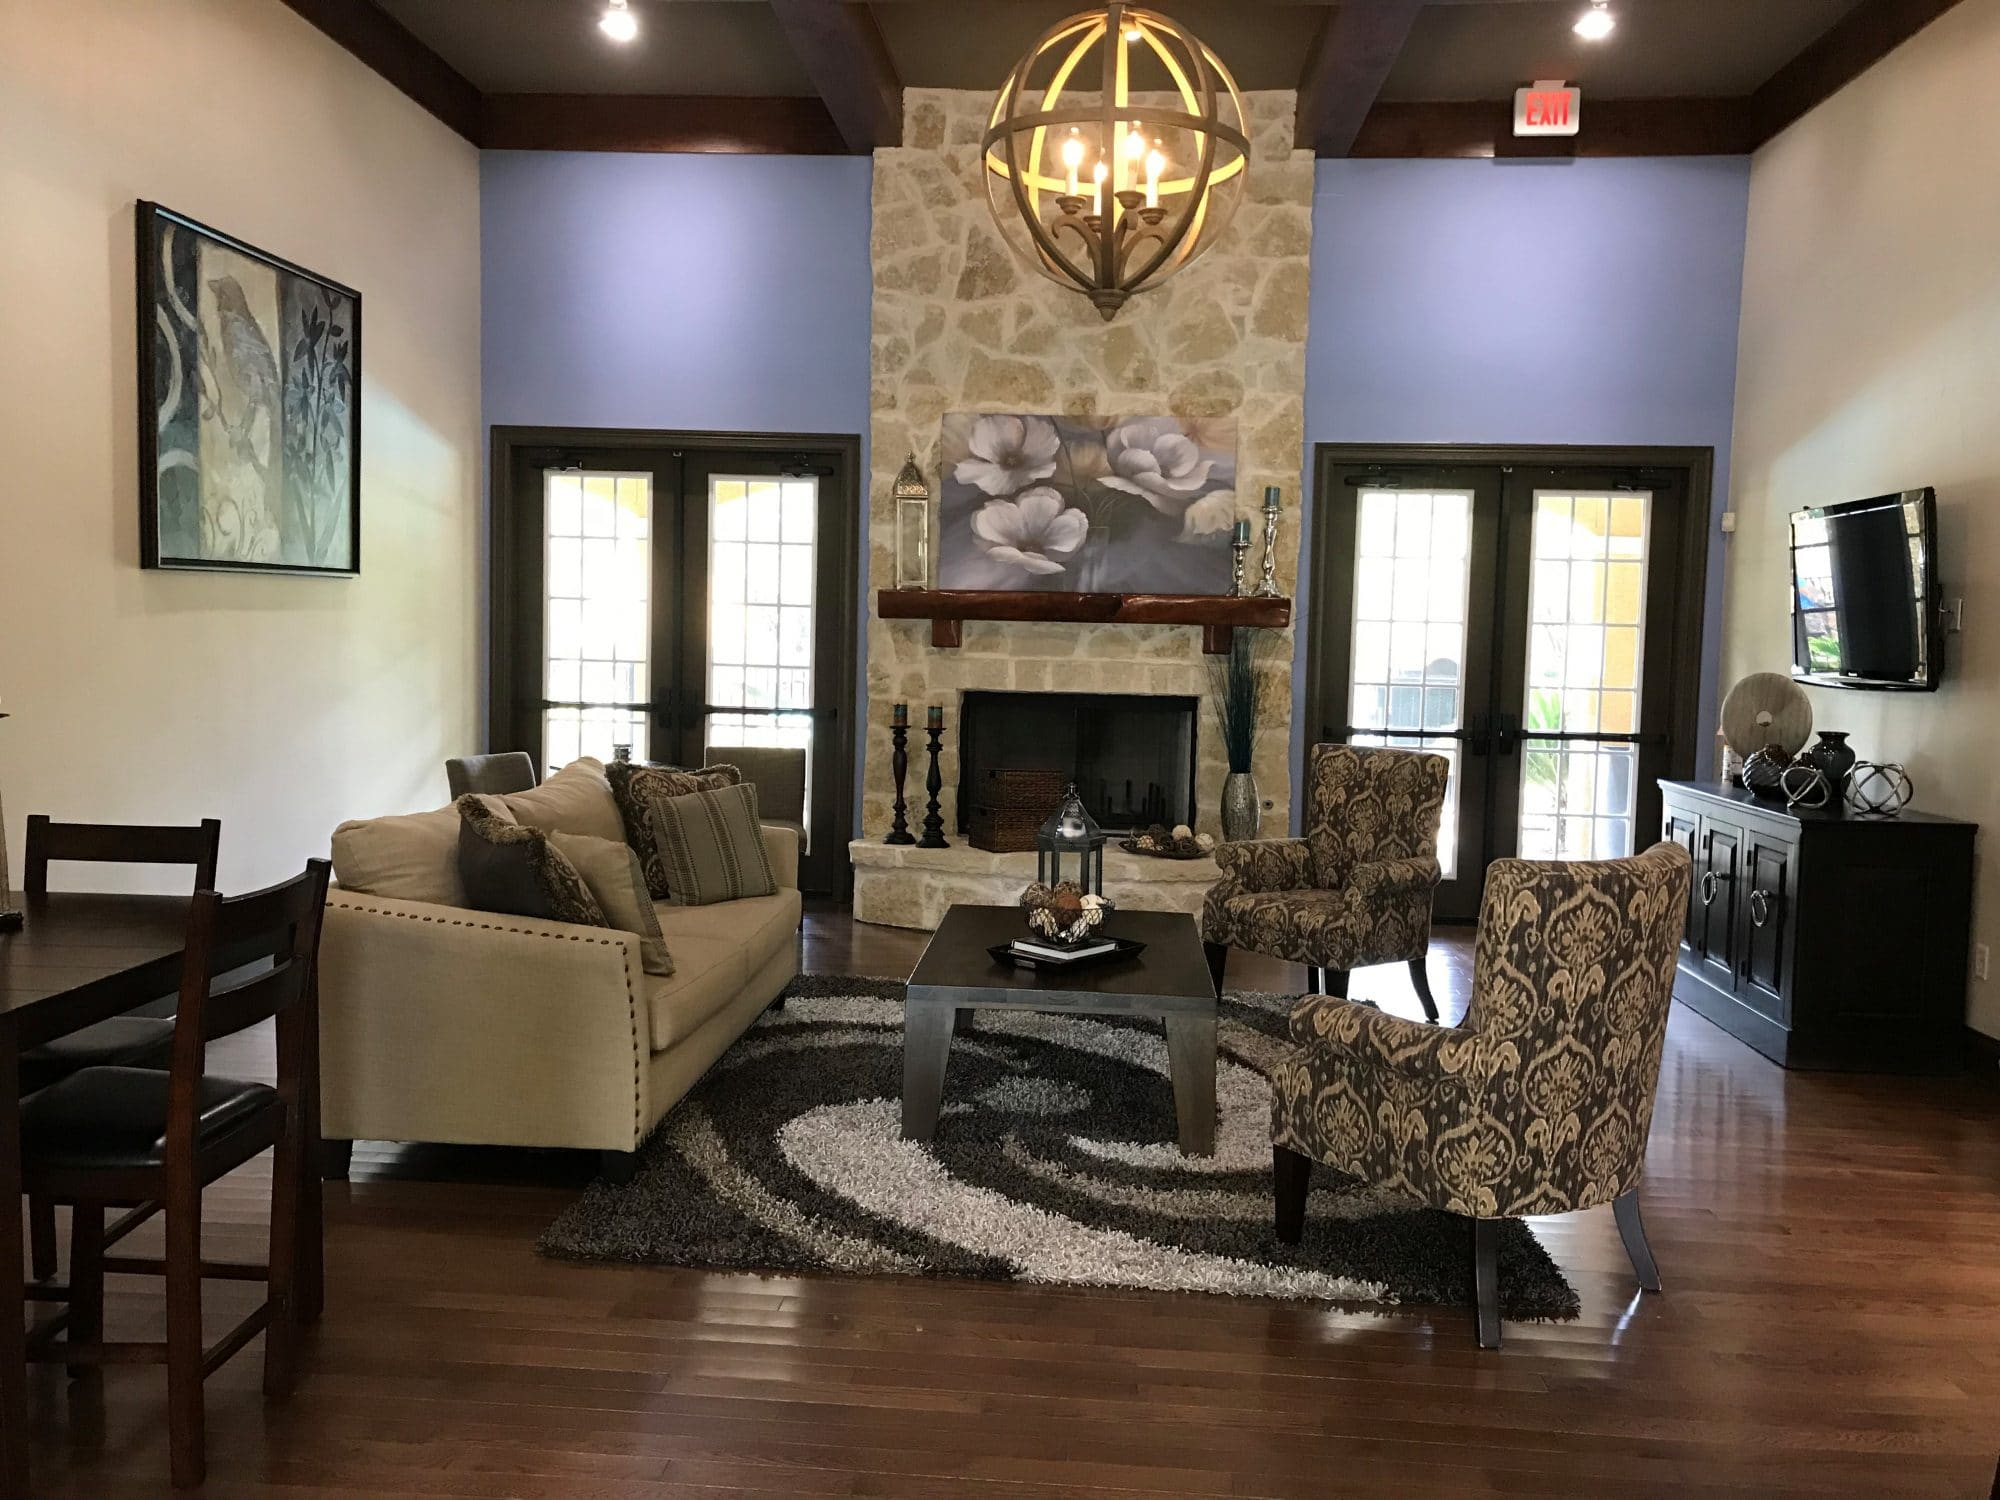 One Bedroom Apartment Rental in San Antonio, TX living